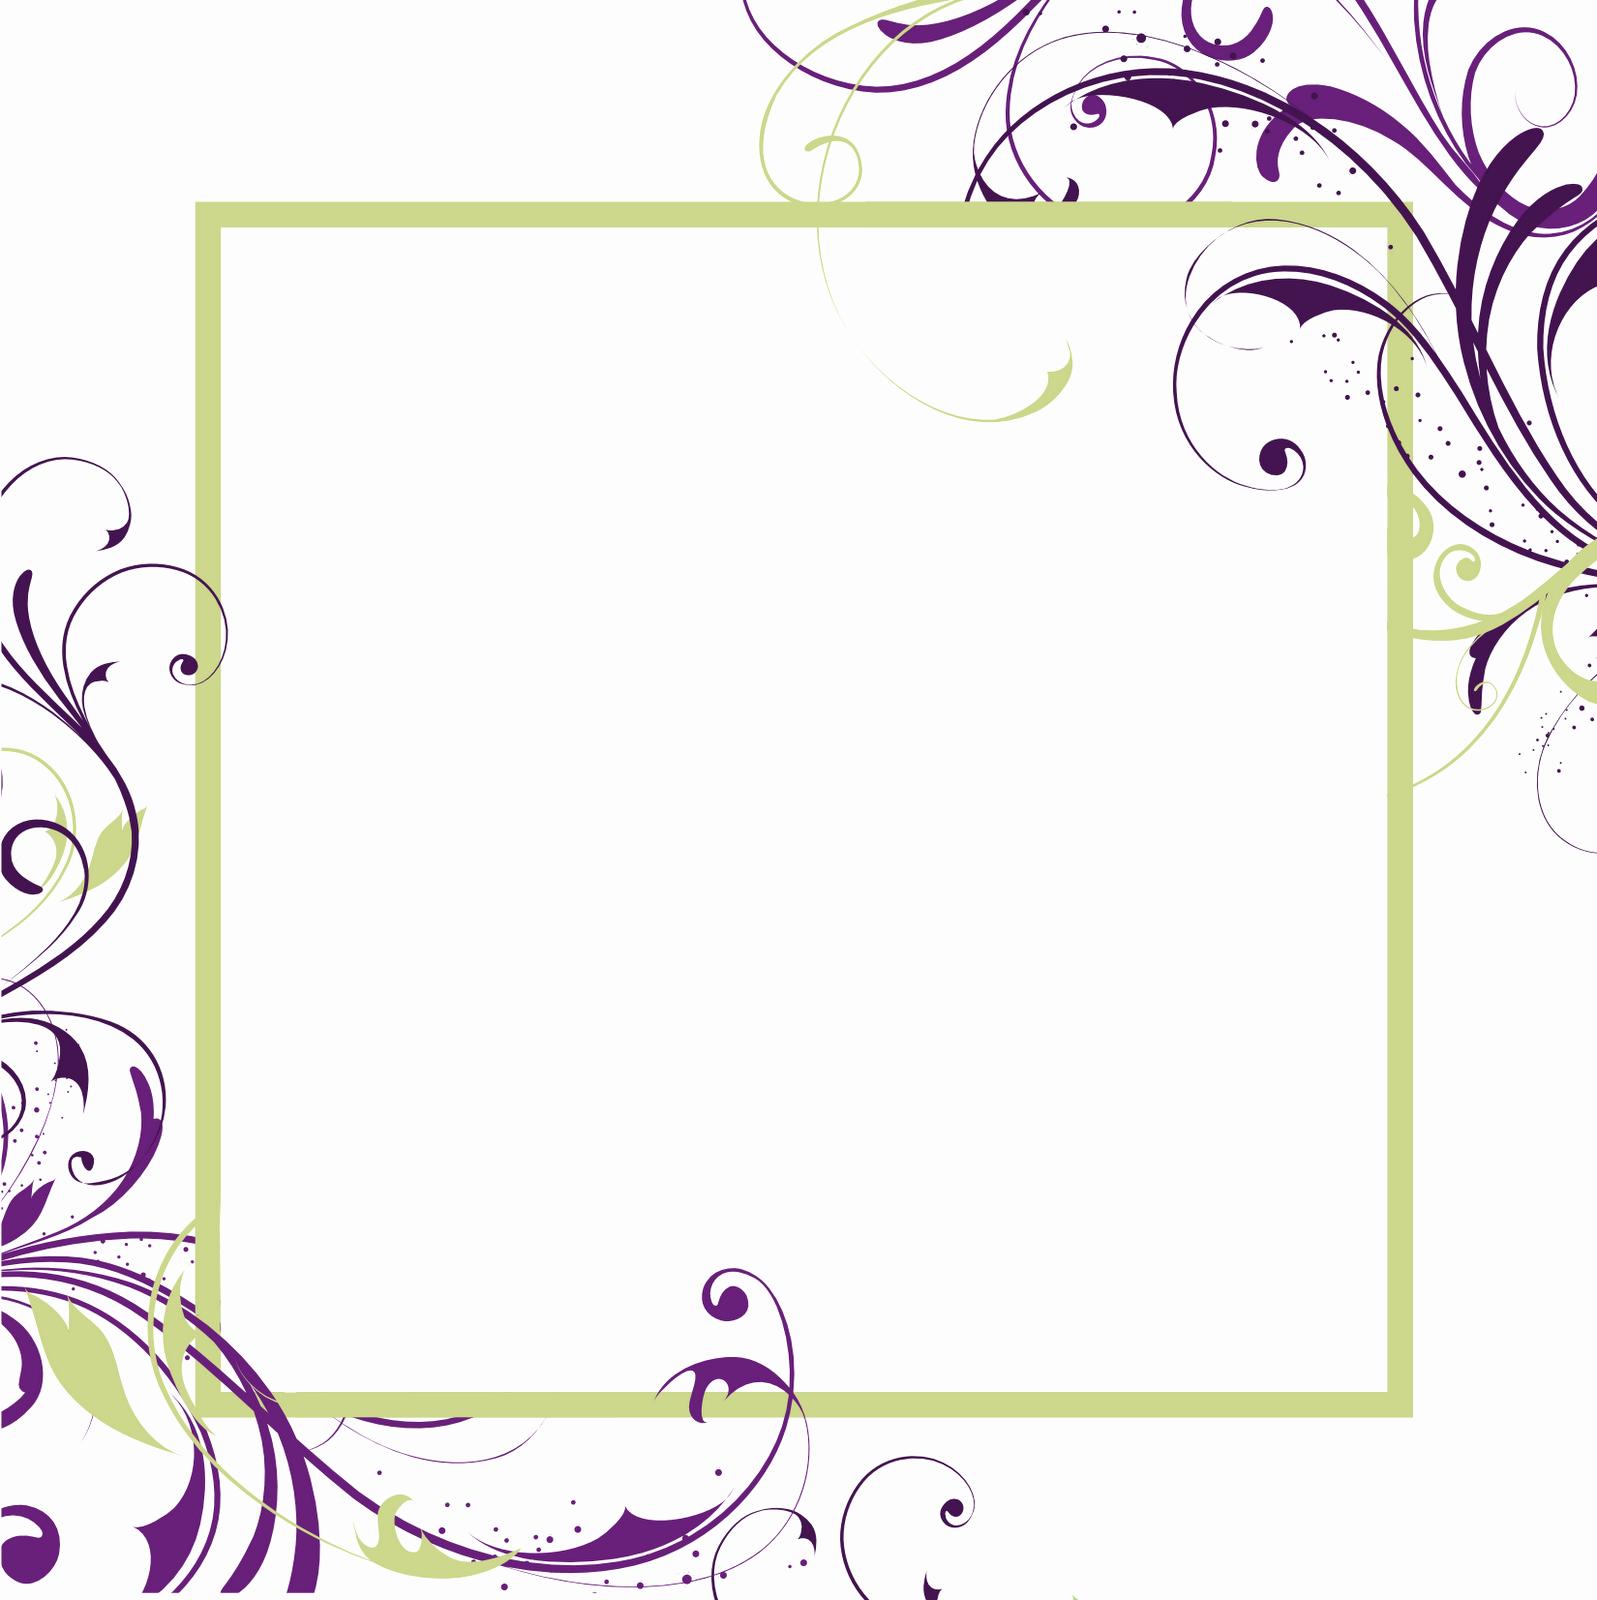 Free Online Invitation Templates Fresh Free Printable Blank Invitations Templates